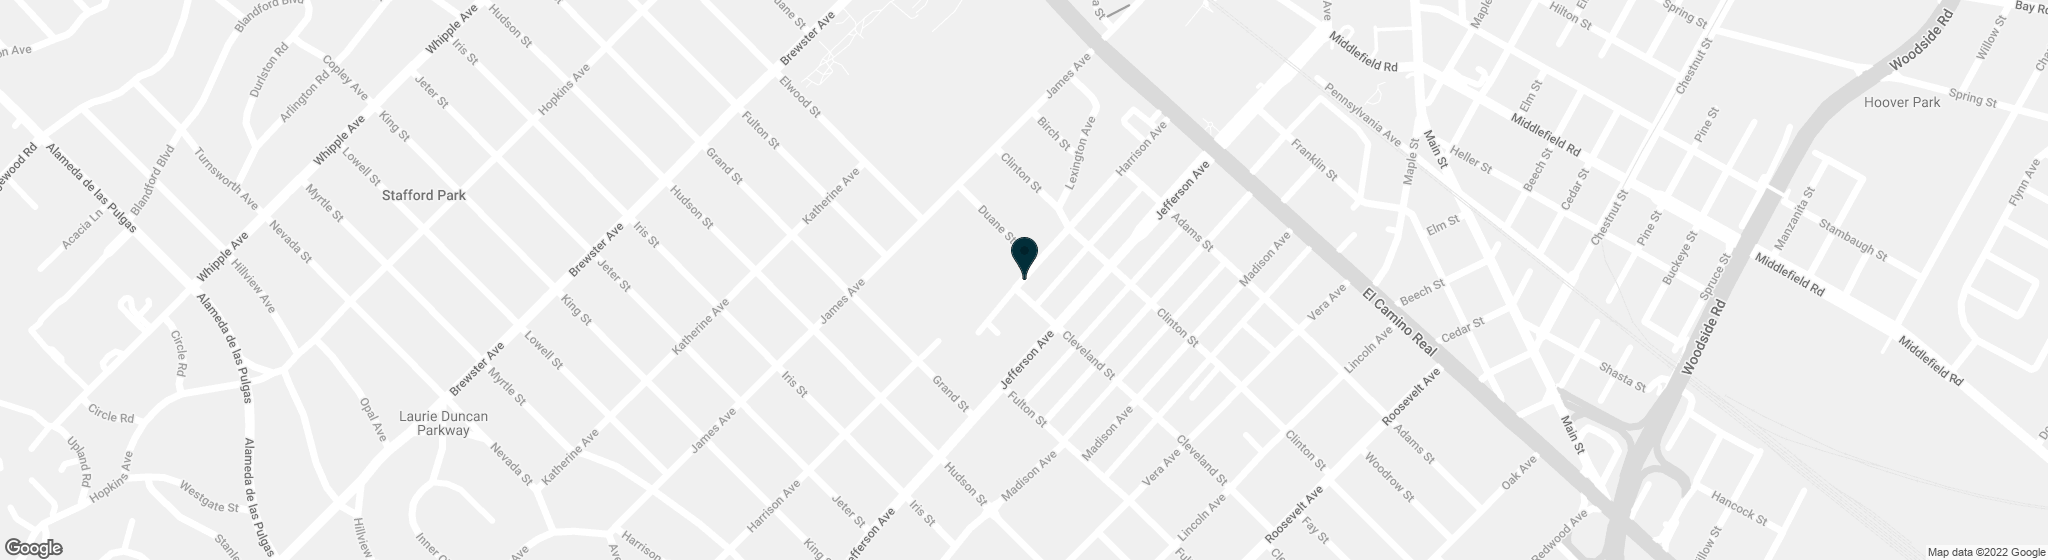 477 Harrison Redwood City CA 94062